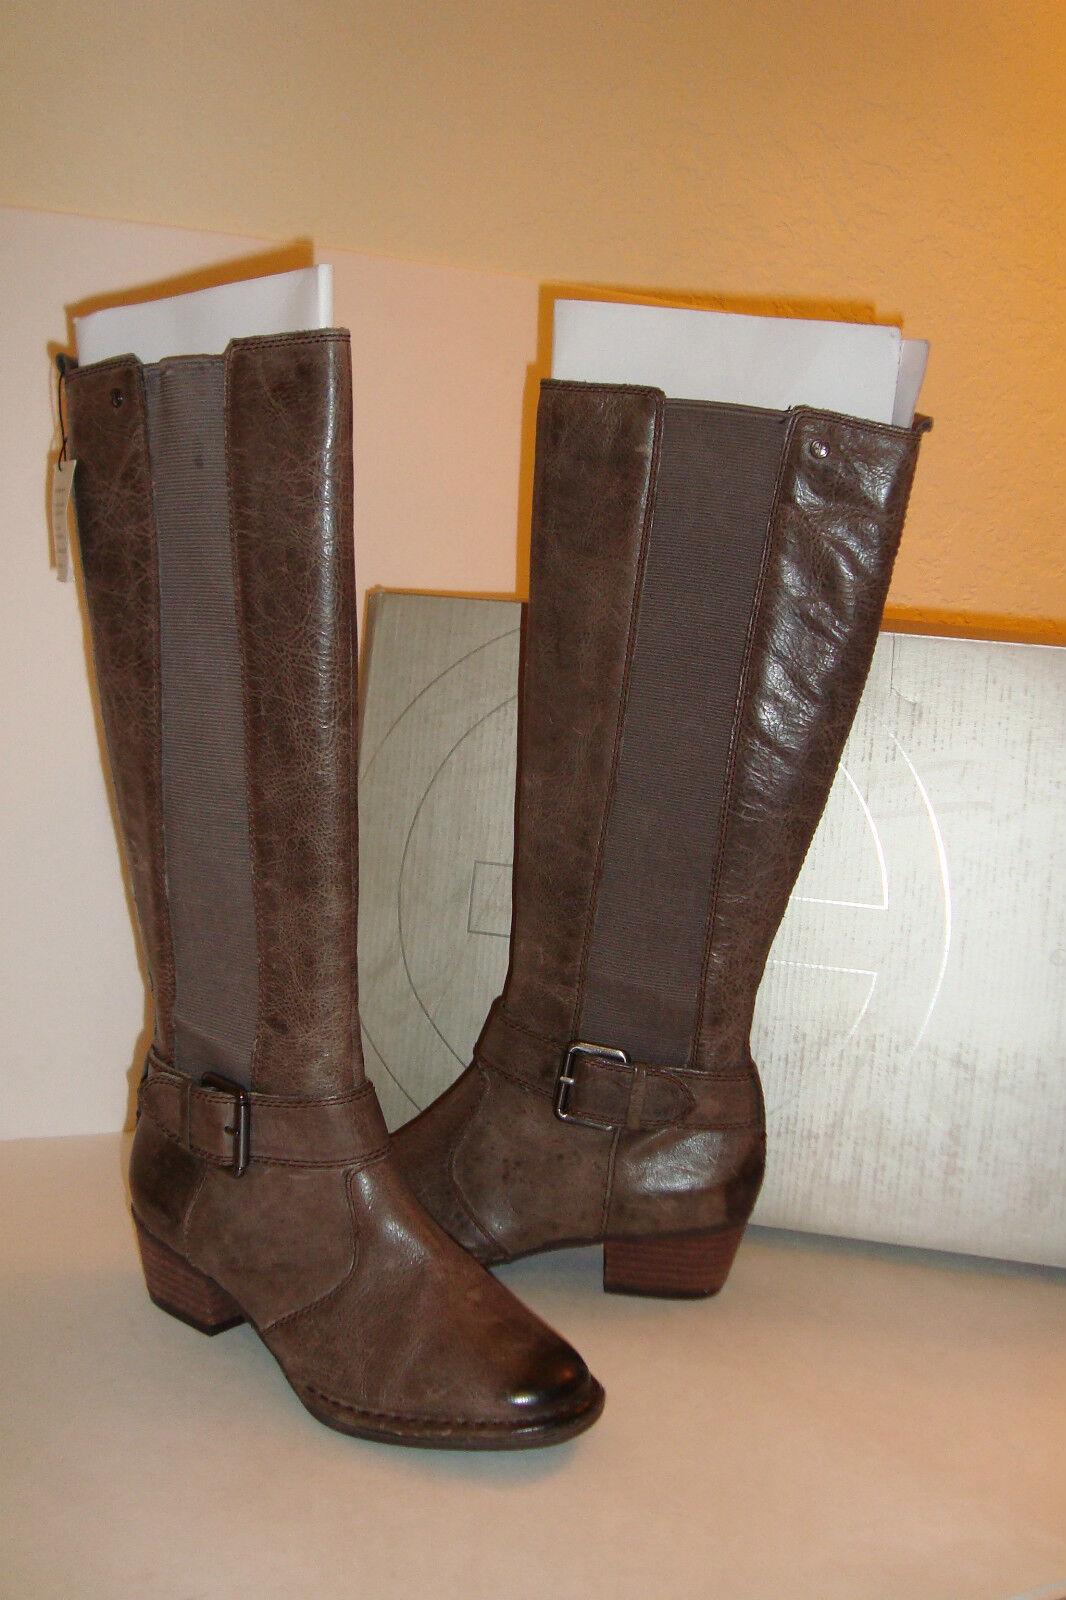 Giani Bernini Damenschuhe NWB AllCott Gray Stone Stiefel Schuhes 5.5 MED NEU